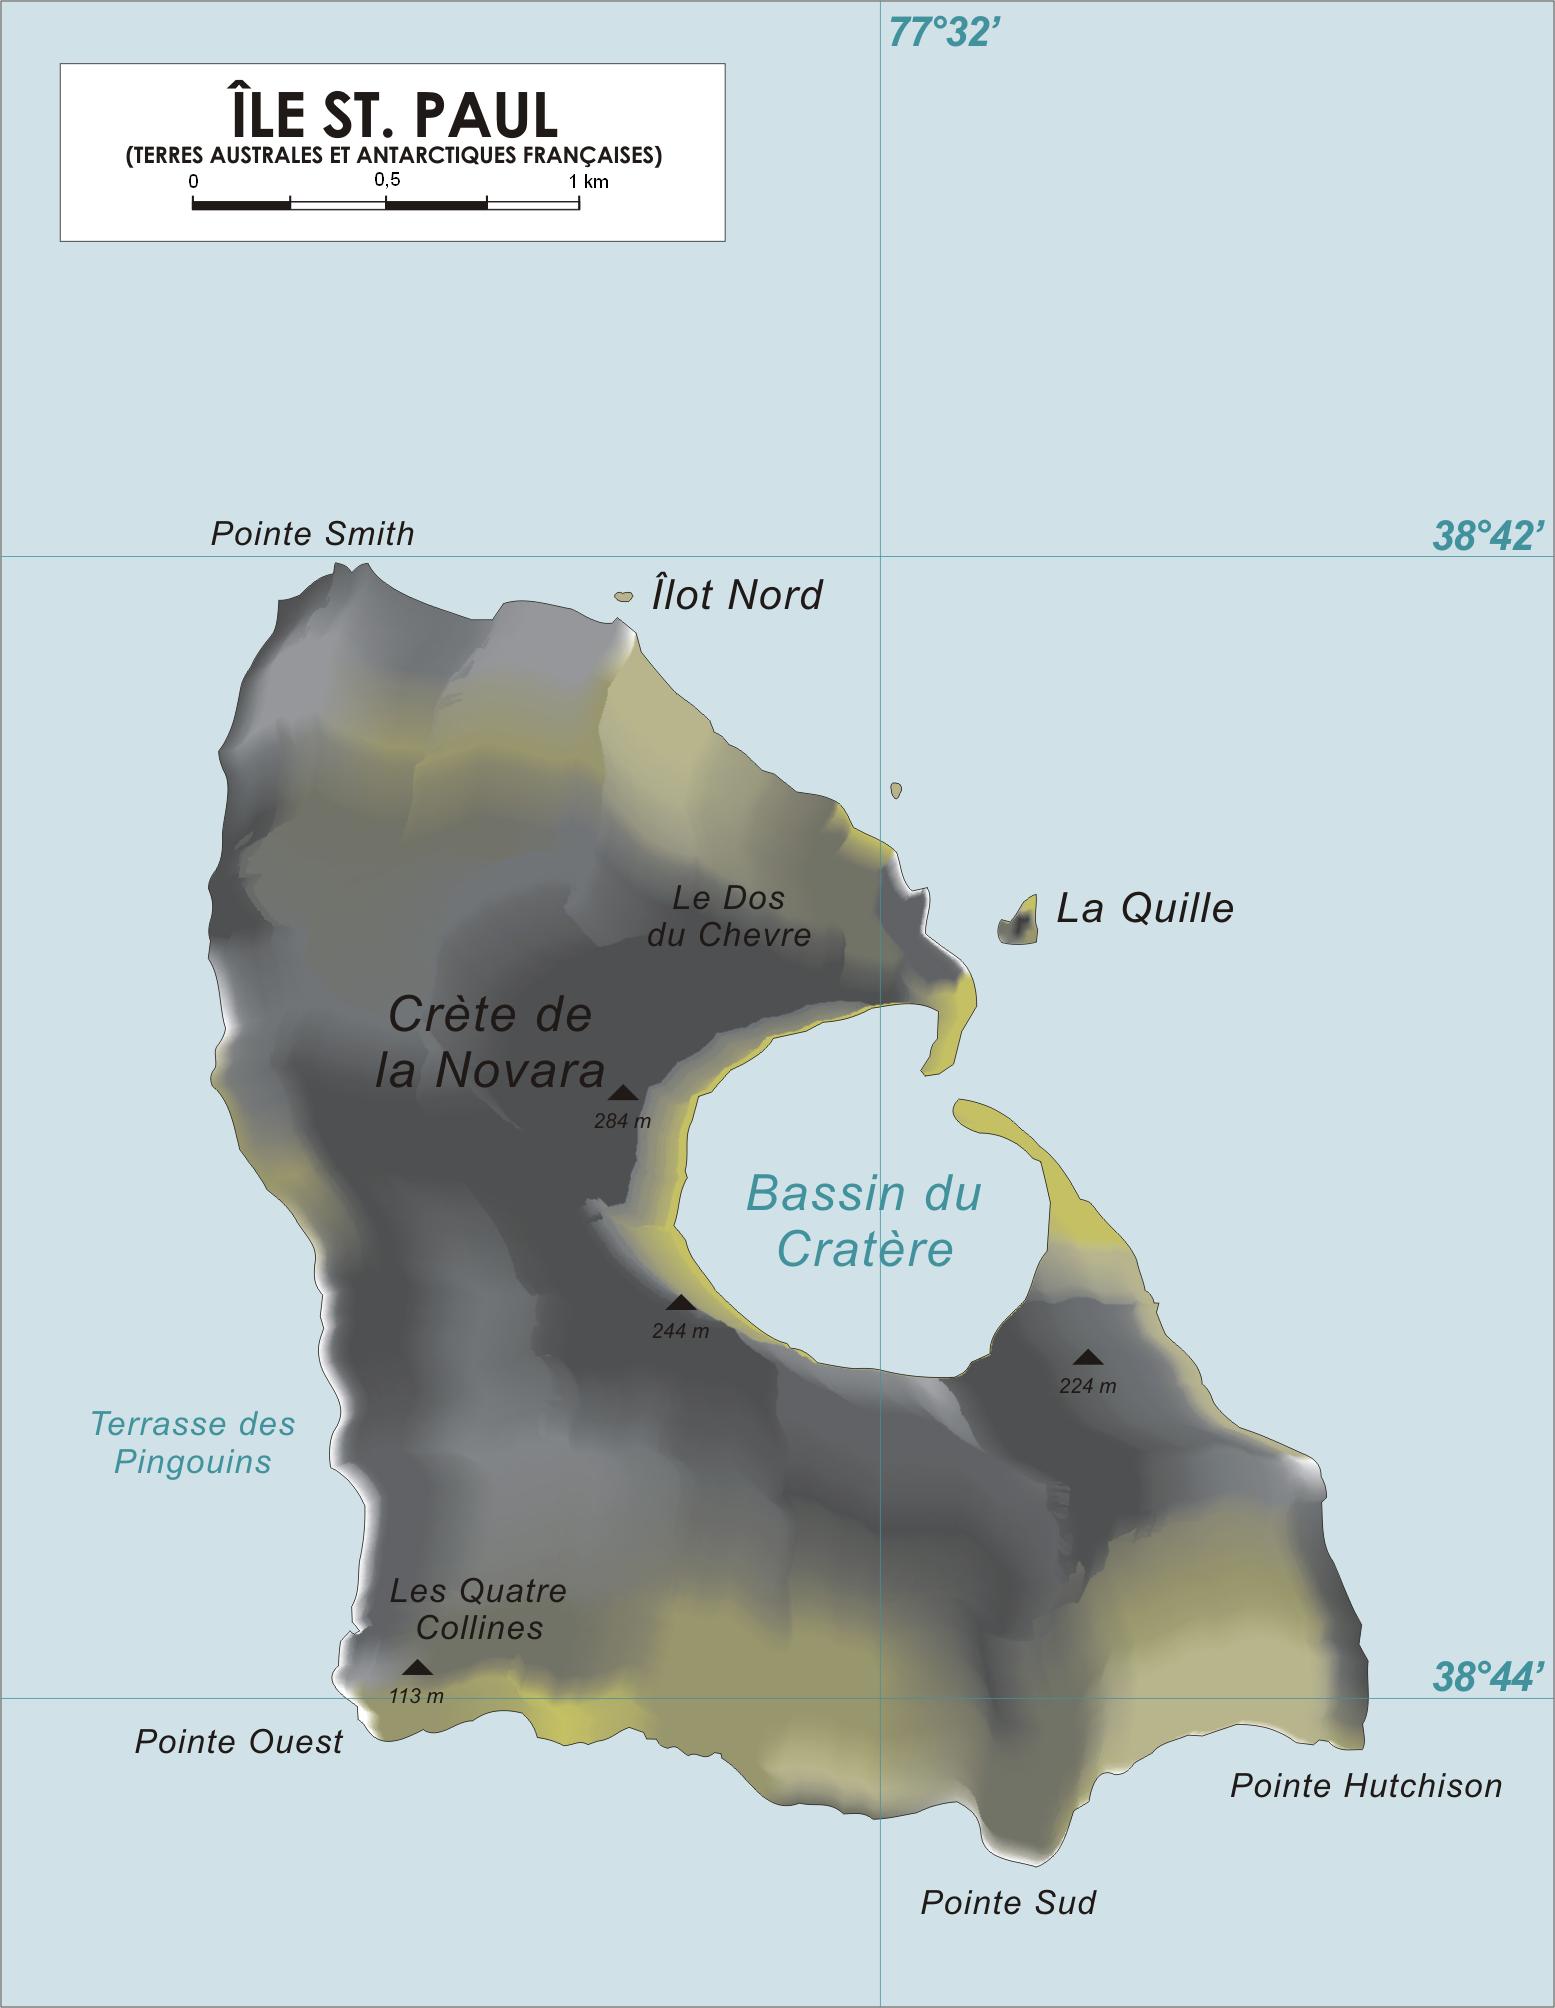 Map of Saint-Paul Island